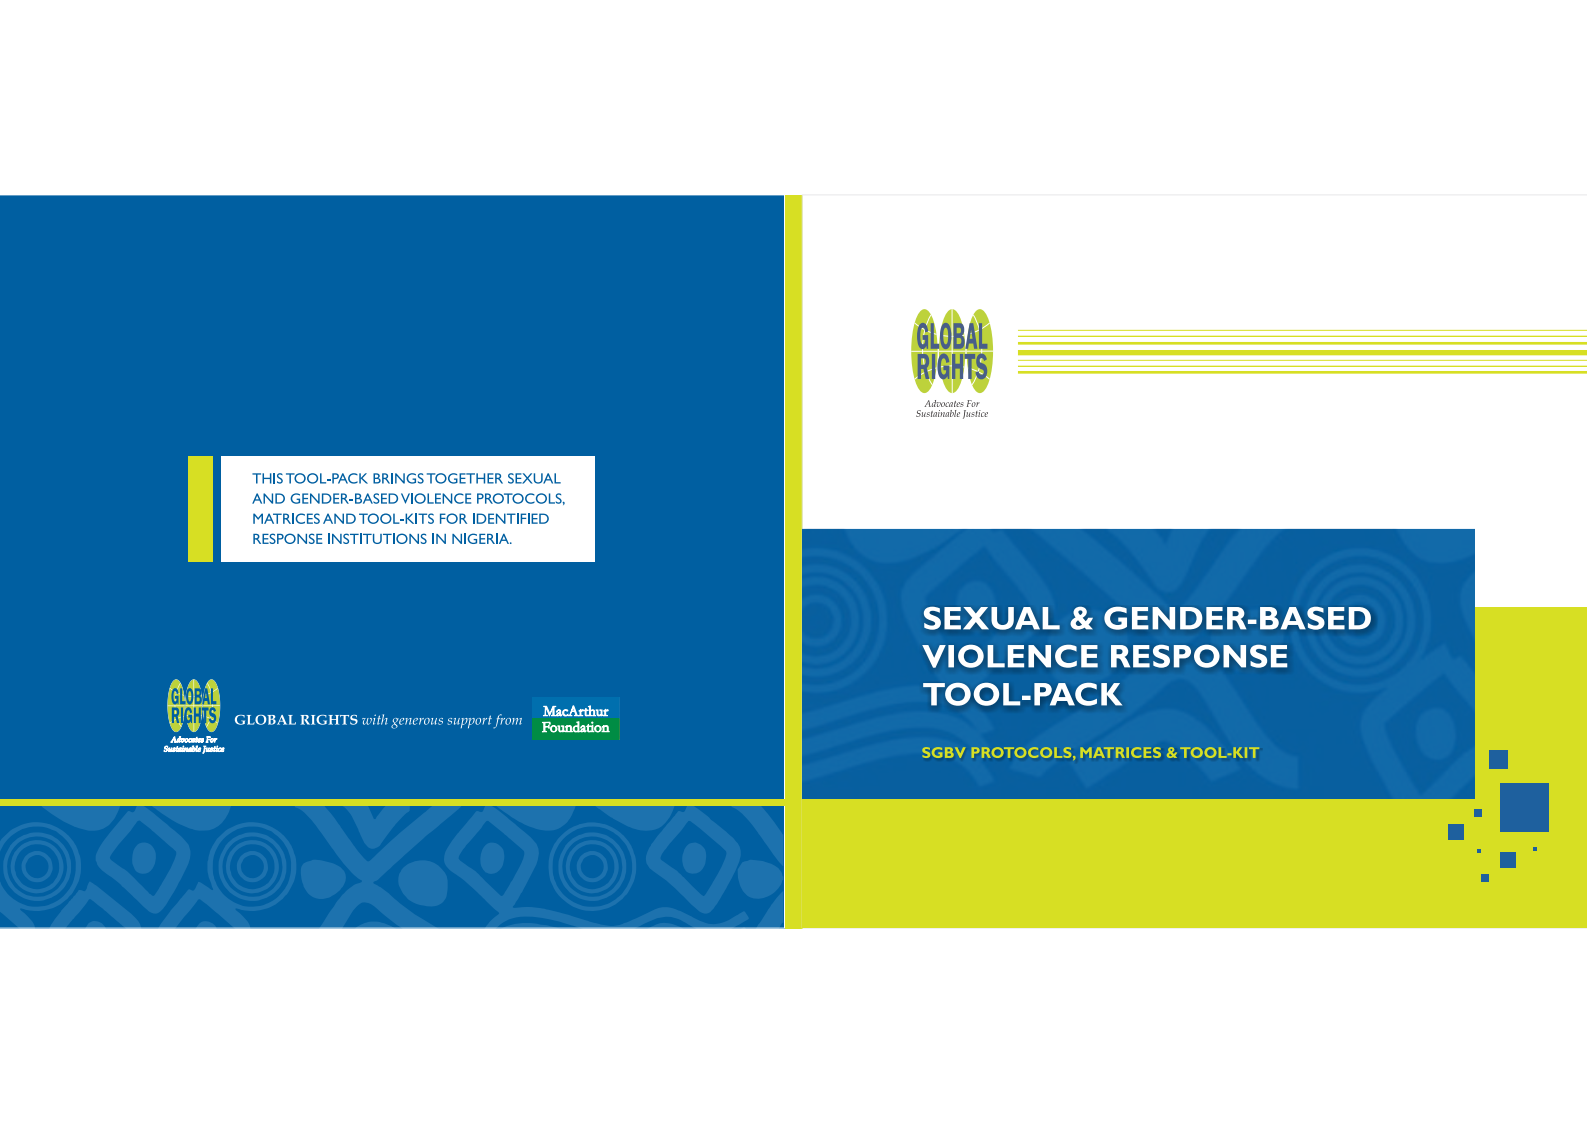 Sexual & Gender Based Violence Response Tool-Pack